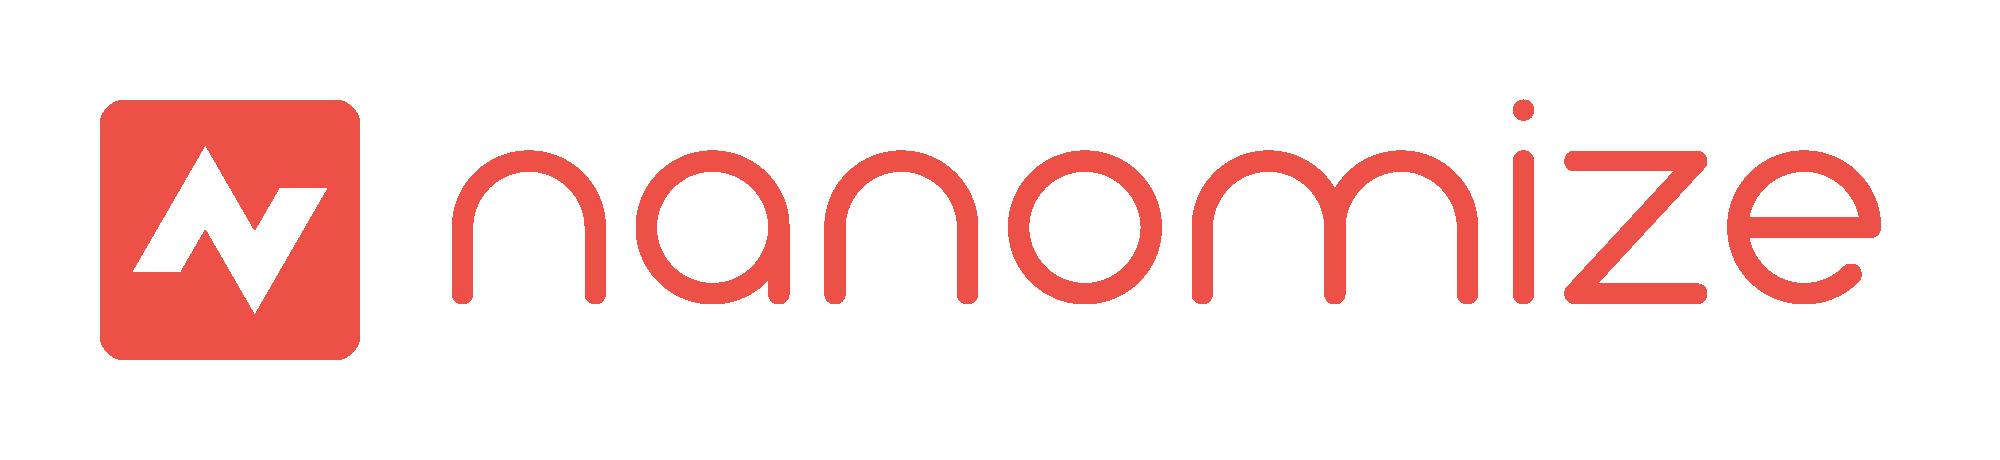 Modern logo for a social media marketing application